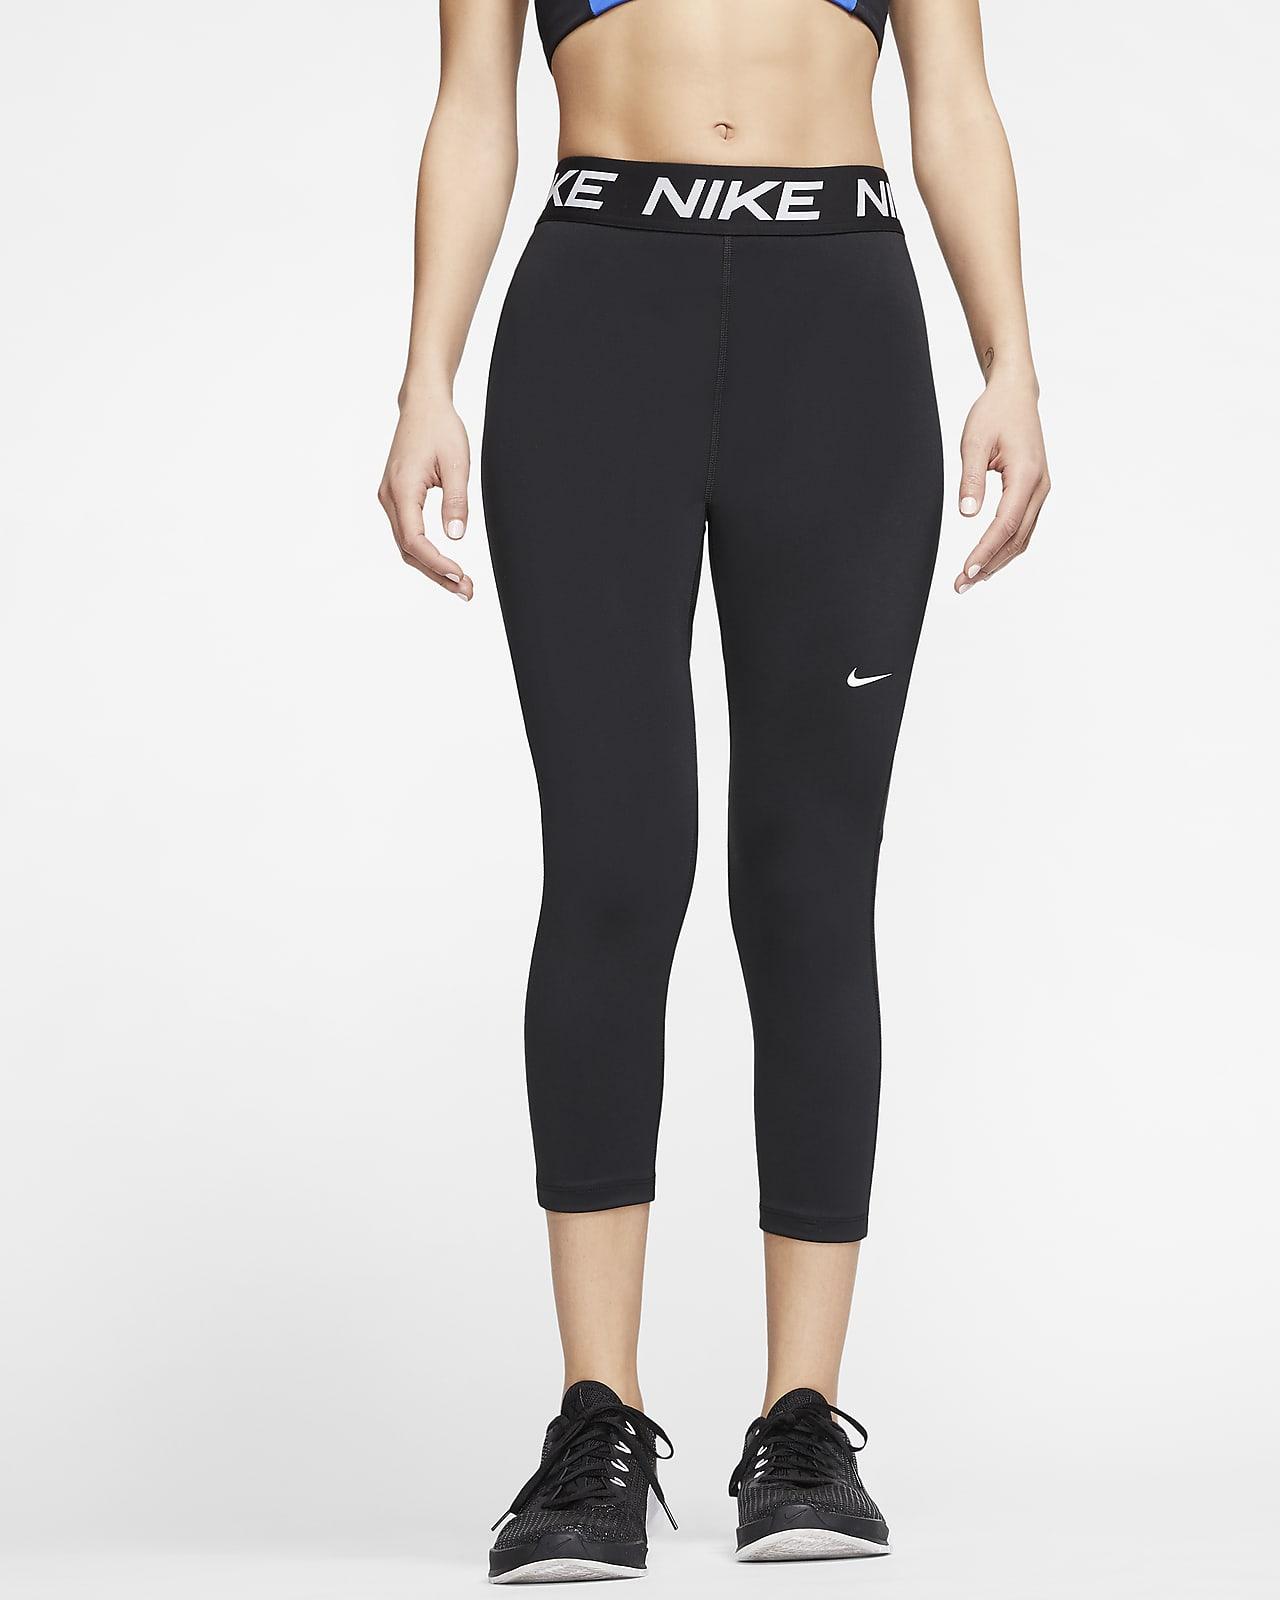 Nike Victory Kadın Antrenman Kaprisi